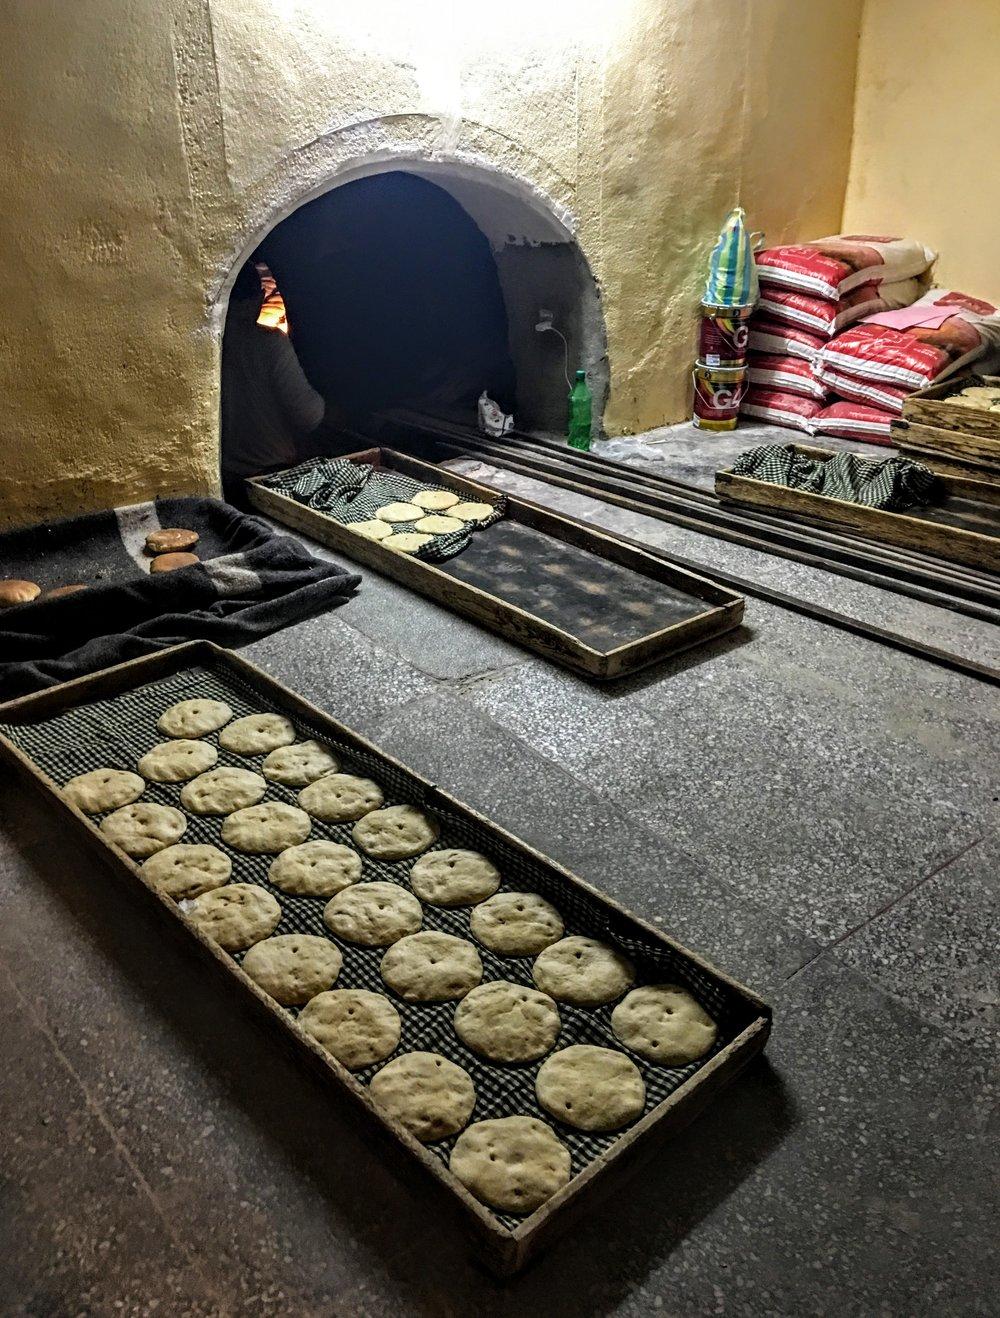 Marrakech Communal Bread Oven